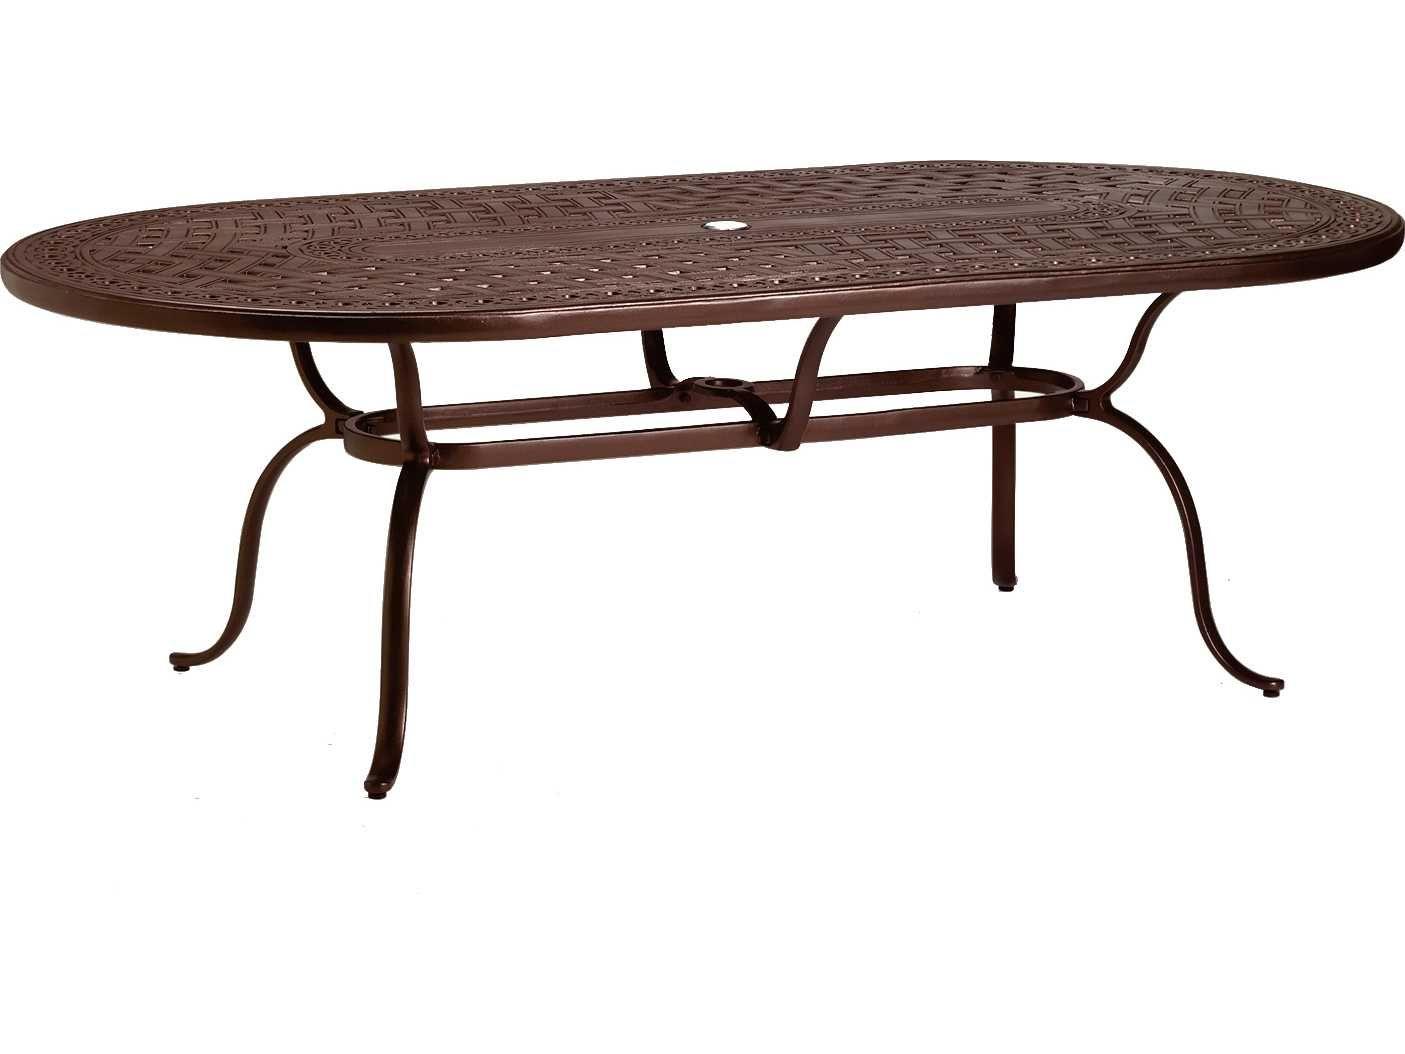 Tropitone Cast Kd Garden Terrace Aluminum 85 Wide X 43 D Oval Dining Table With Umbrella Hole Outdoor Dinning Table Metal Dining Table Dining Table Sizes [ jpg ]